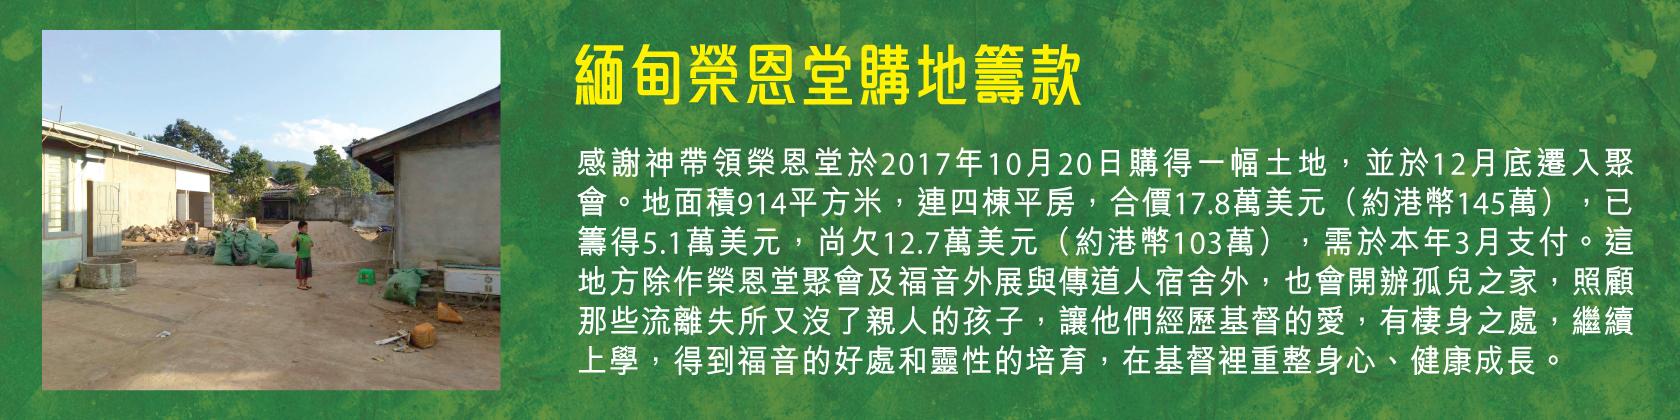 CB-02-web-banner-1680-x-420-06-1